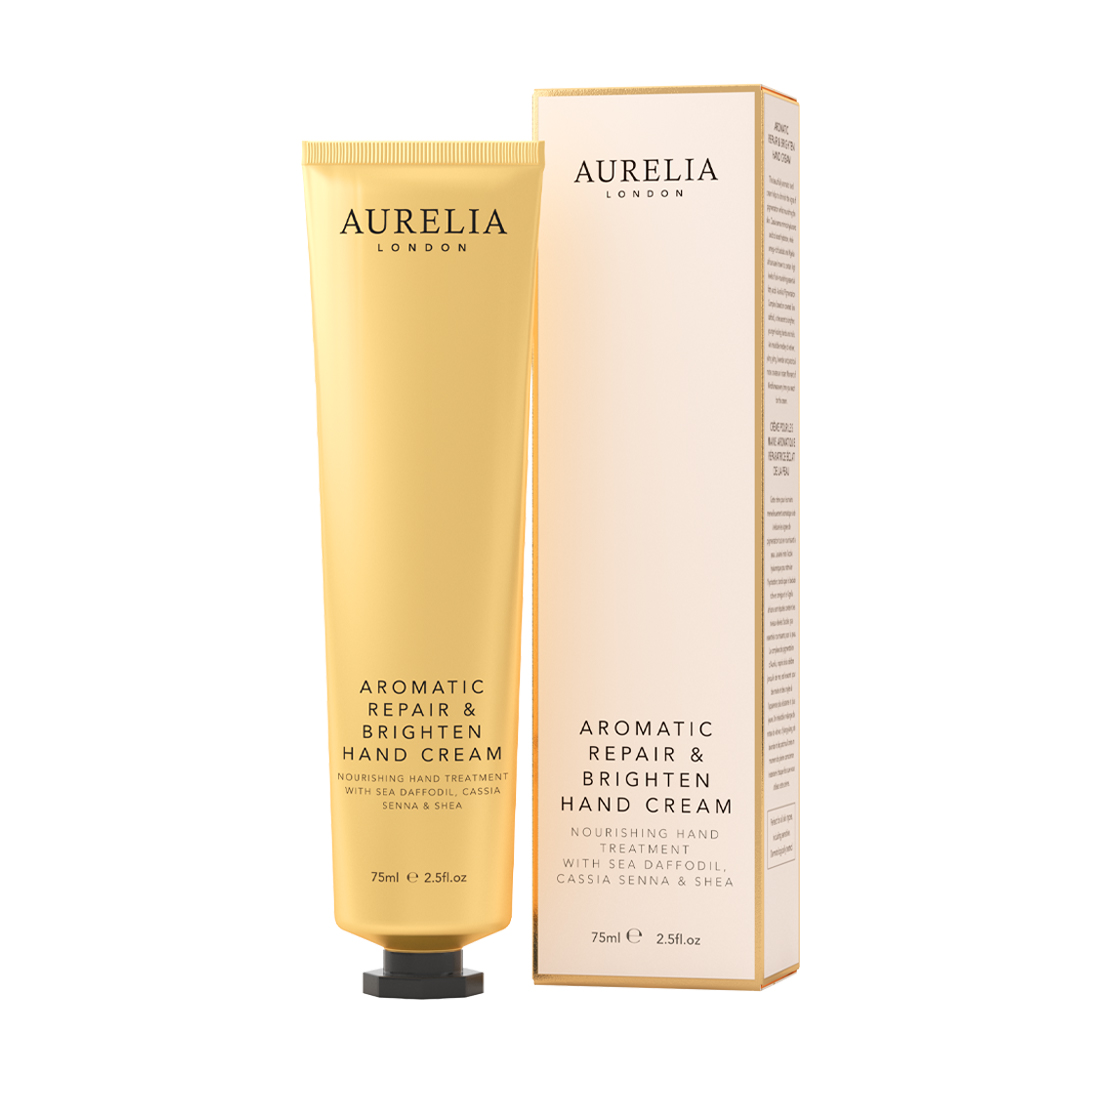 An image of Aromatic Repair & Brighten Hand Cream 75ml Aurelia London